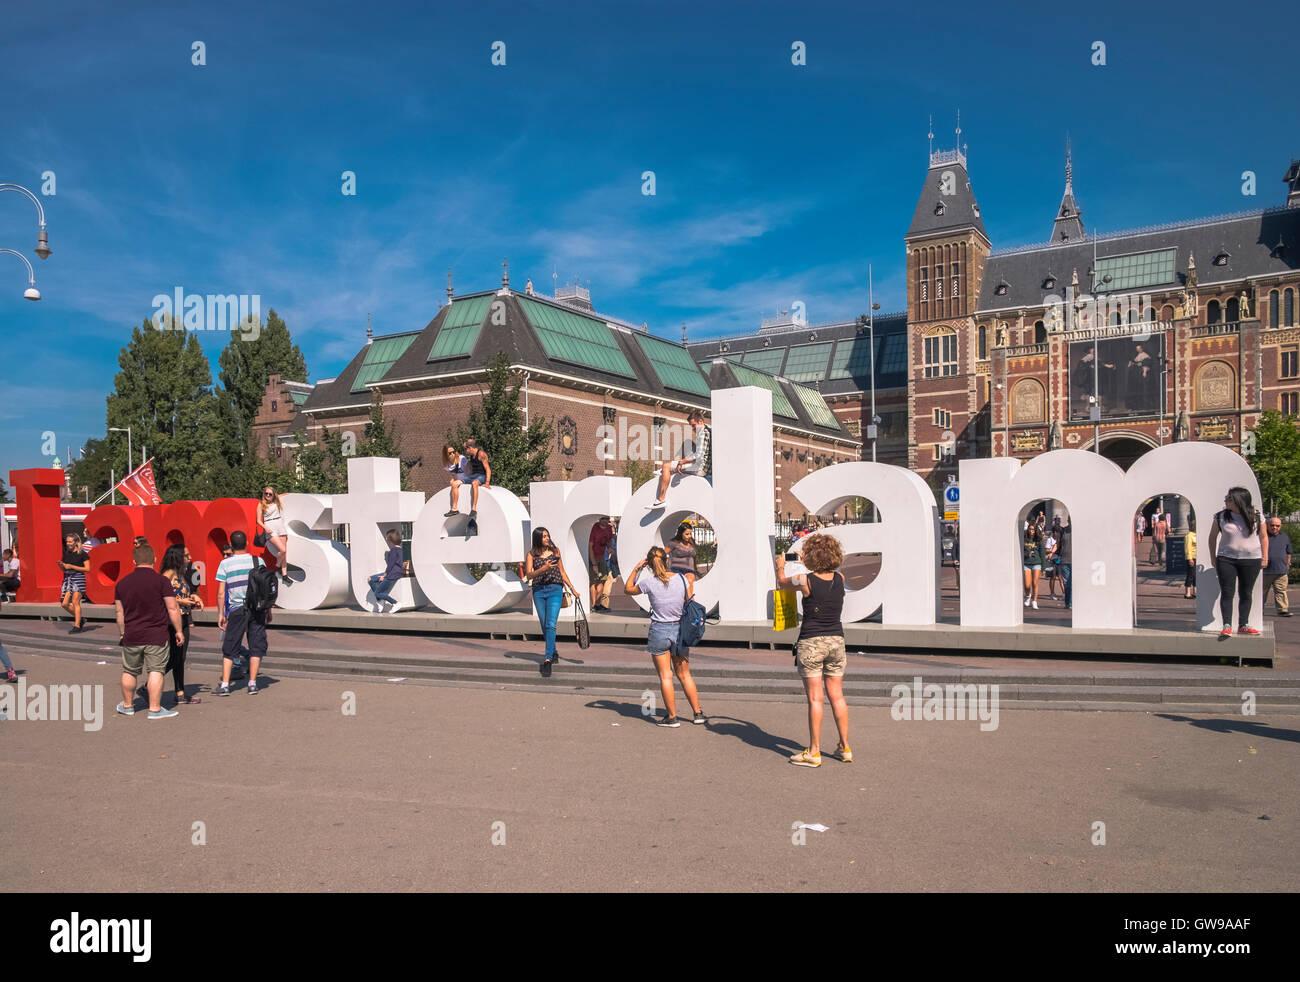 Tourists climbing and sitting on the I Amsterdam signage, Museum Quarter, Amsterdam, Netherlands - Stock Image